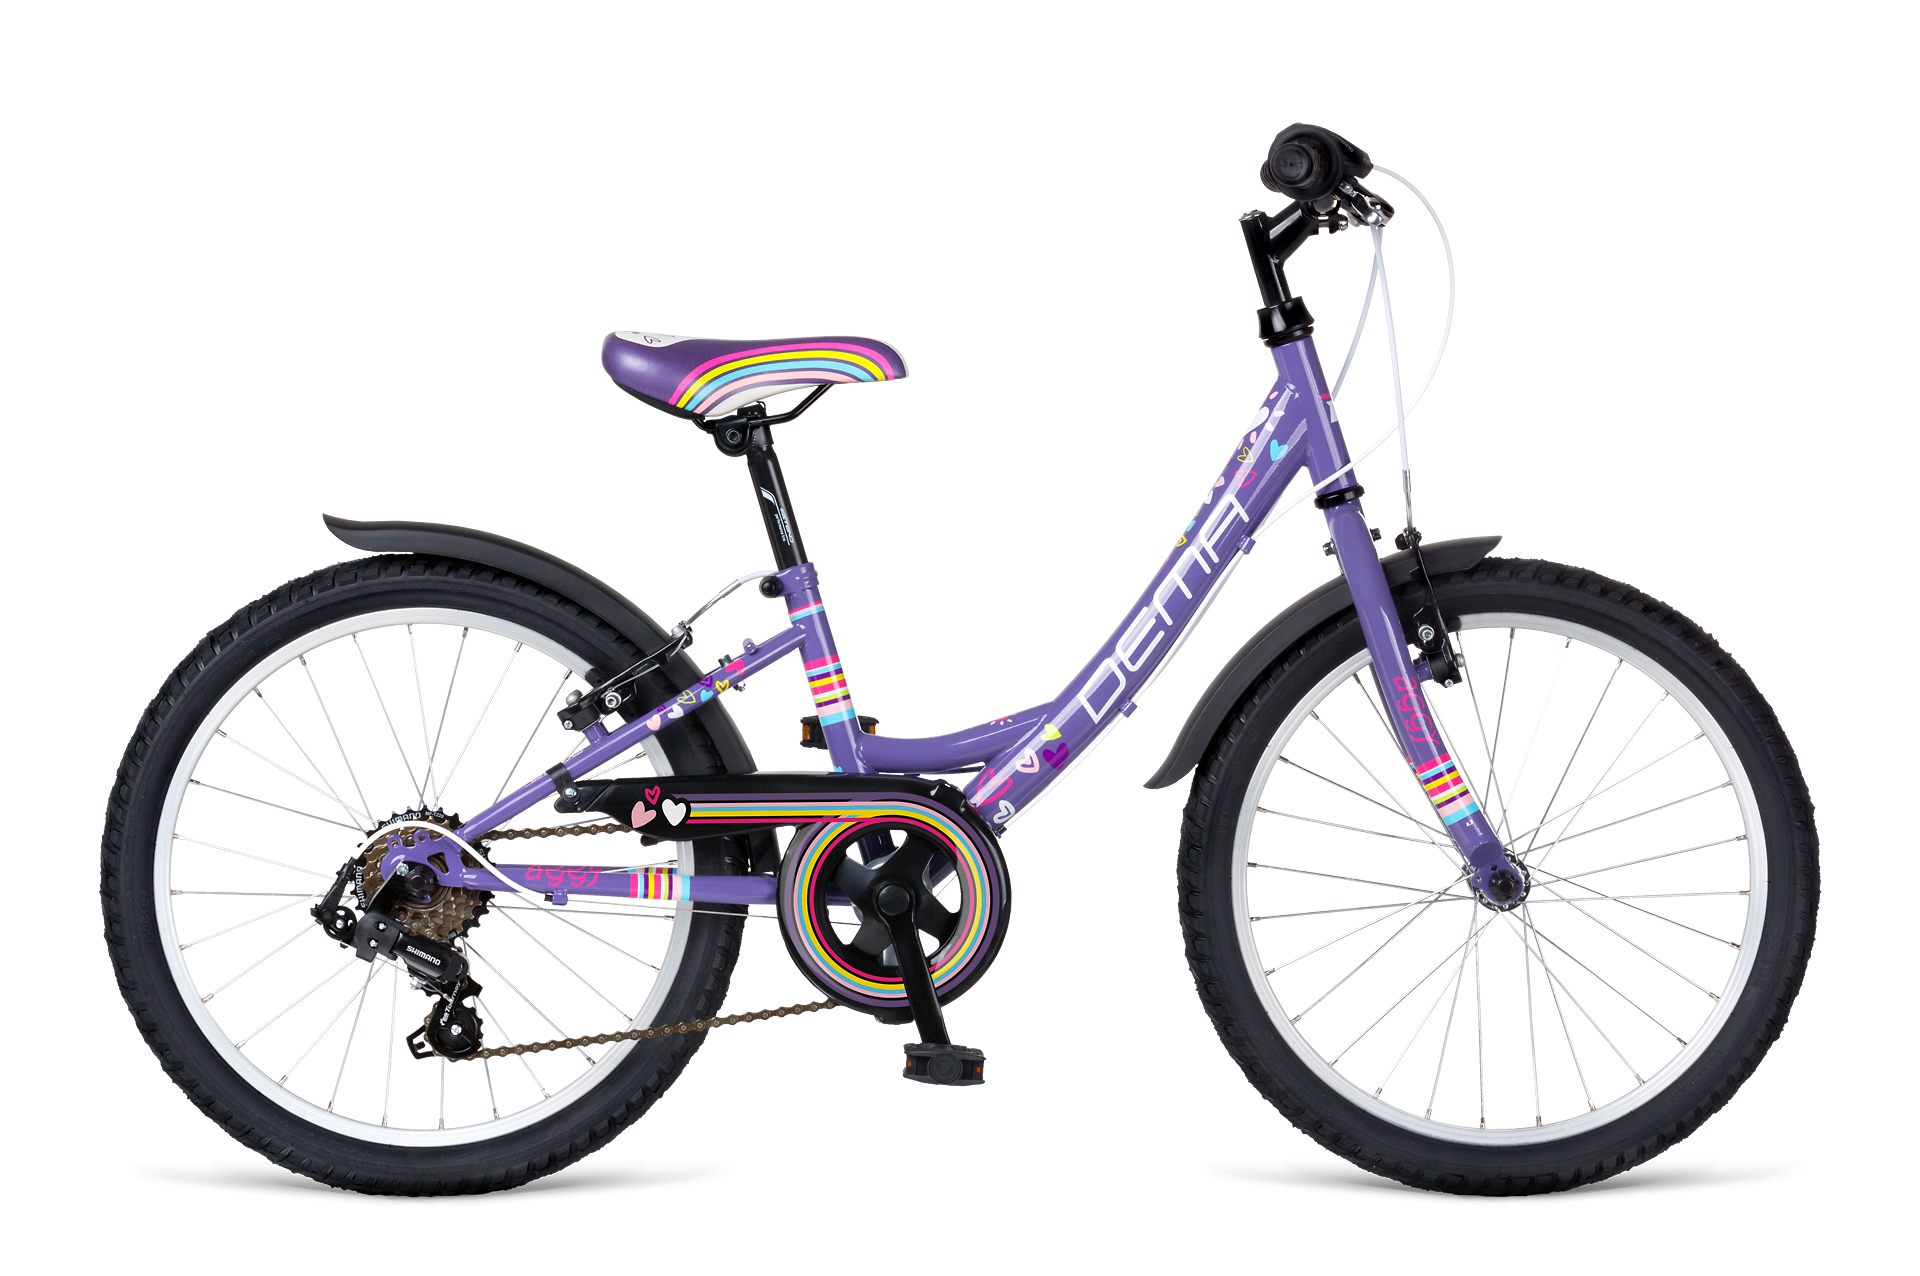 Dema Aggy 20 6sp violet 2017